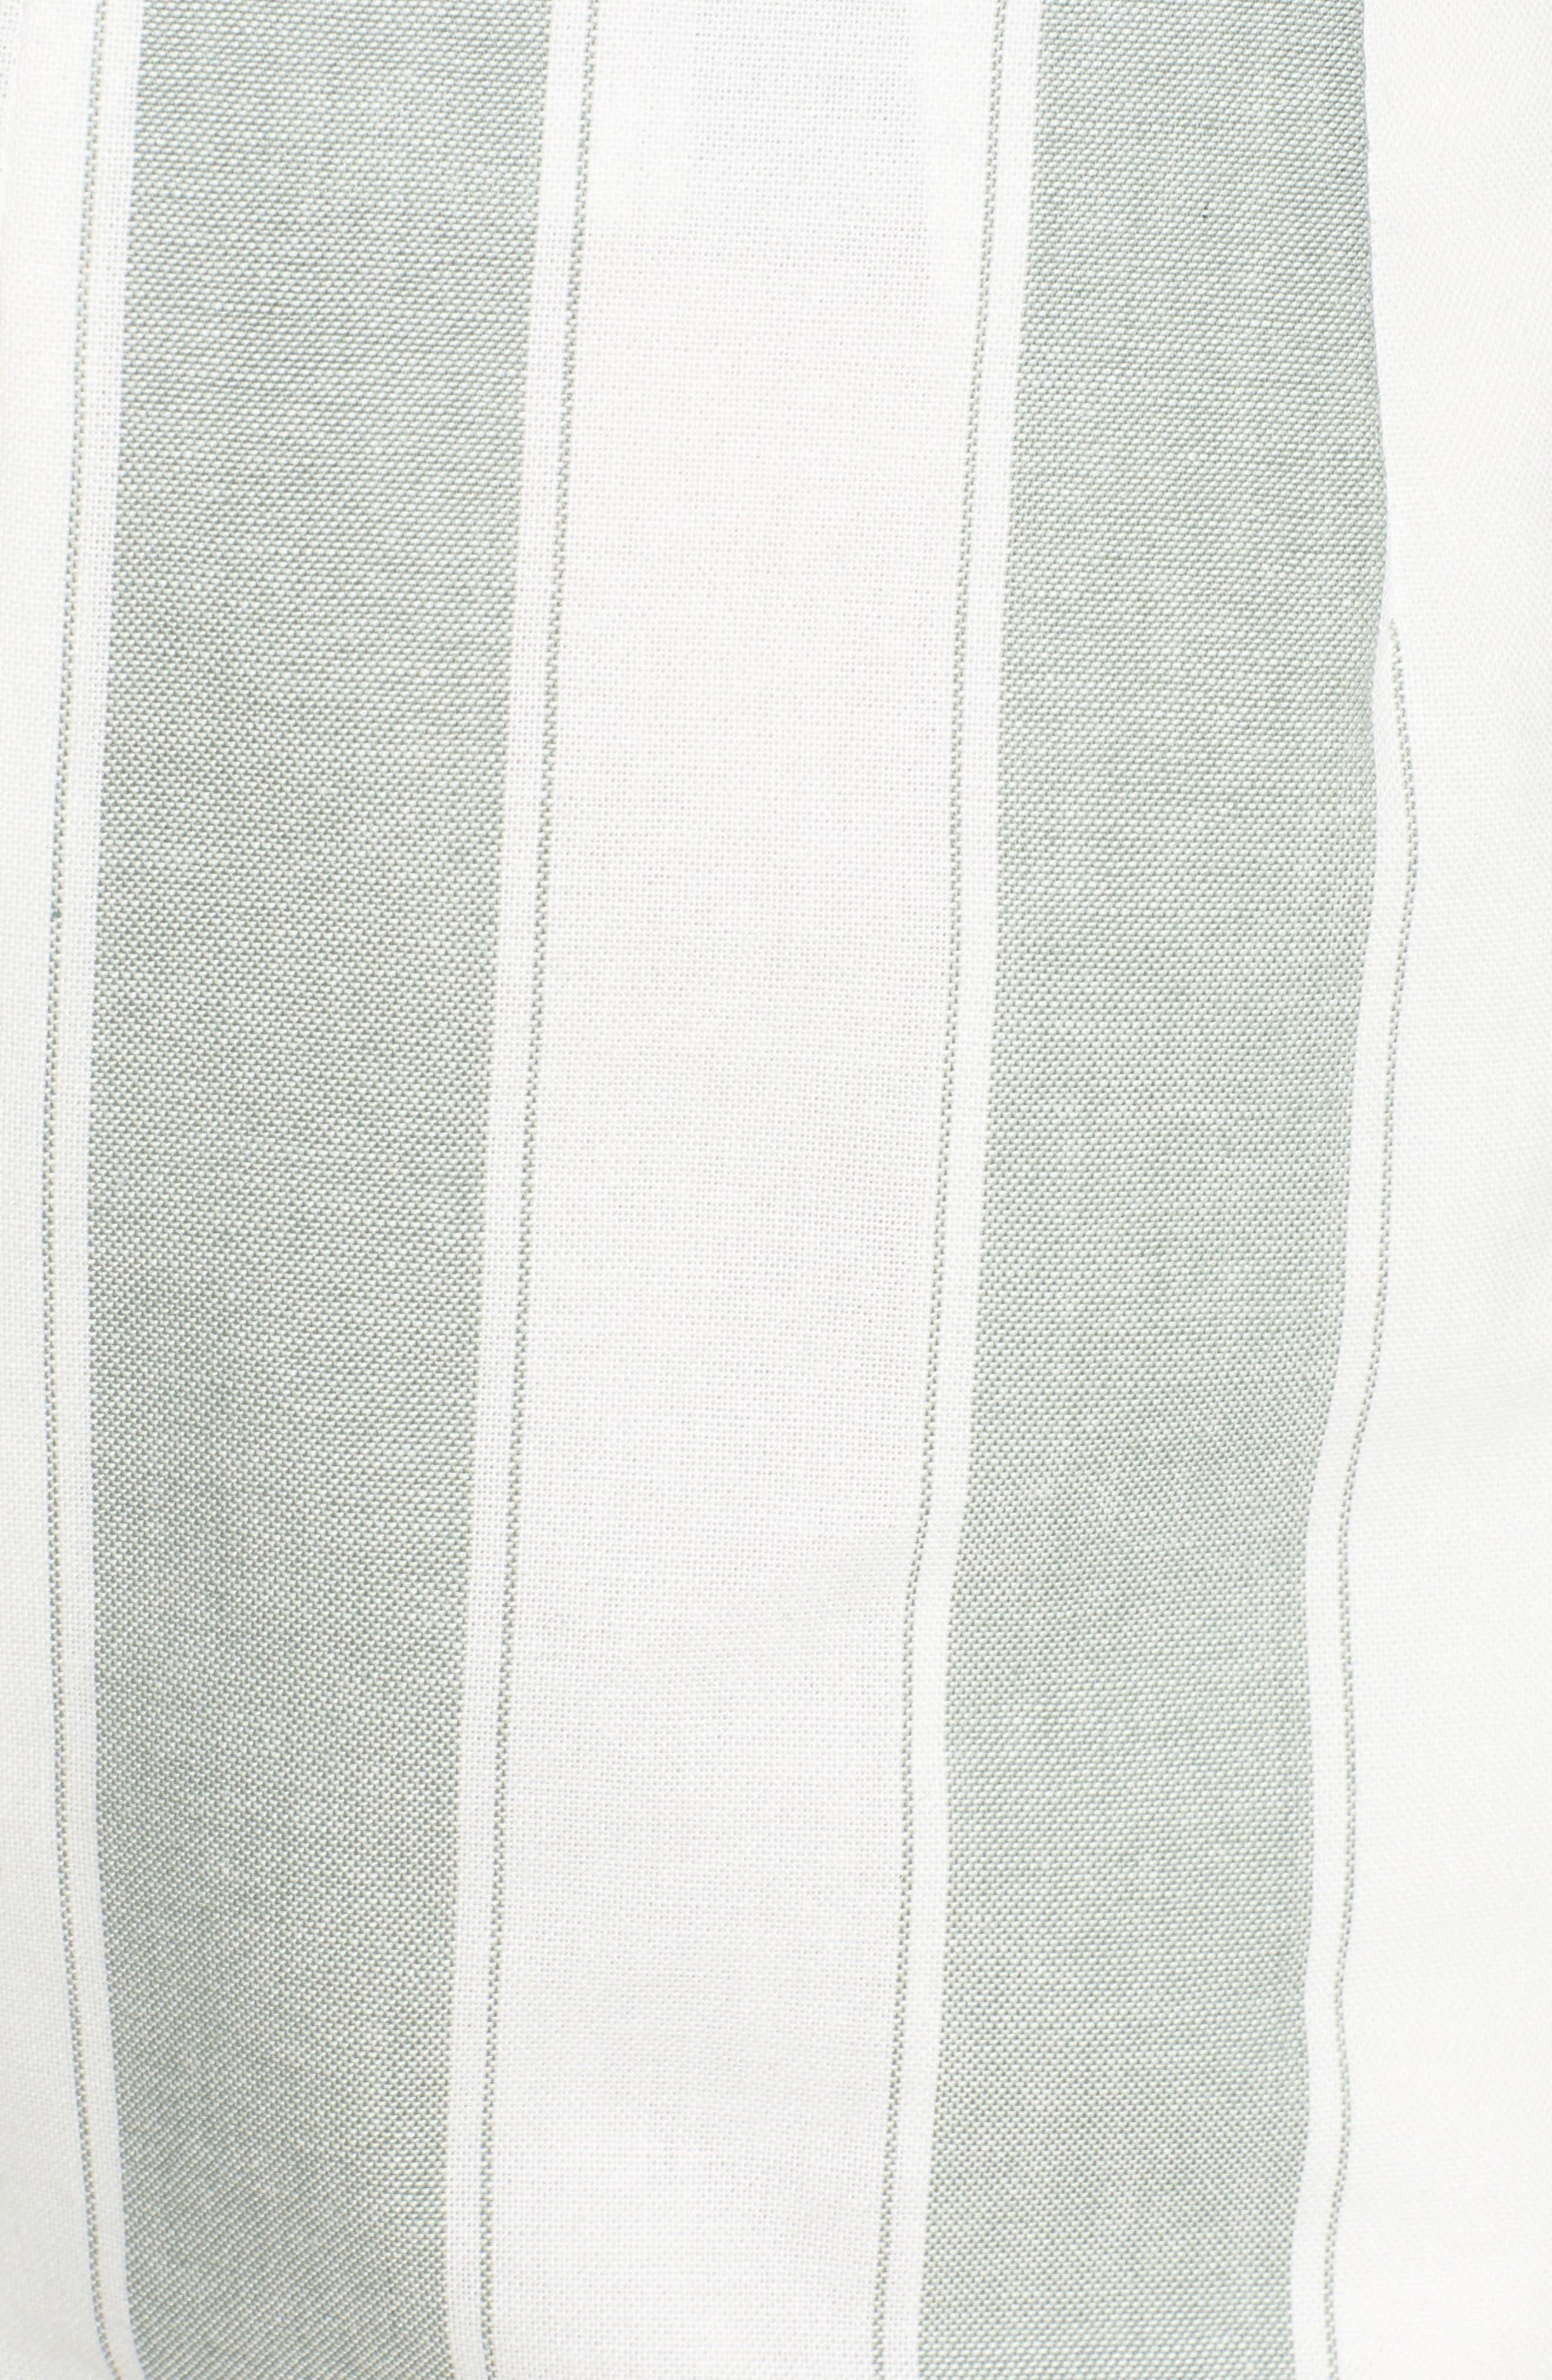 Poetic Stripe Shorts,                             Alternate thumbnail 5, color,                             105